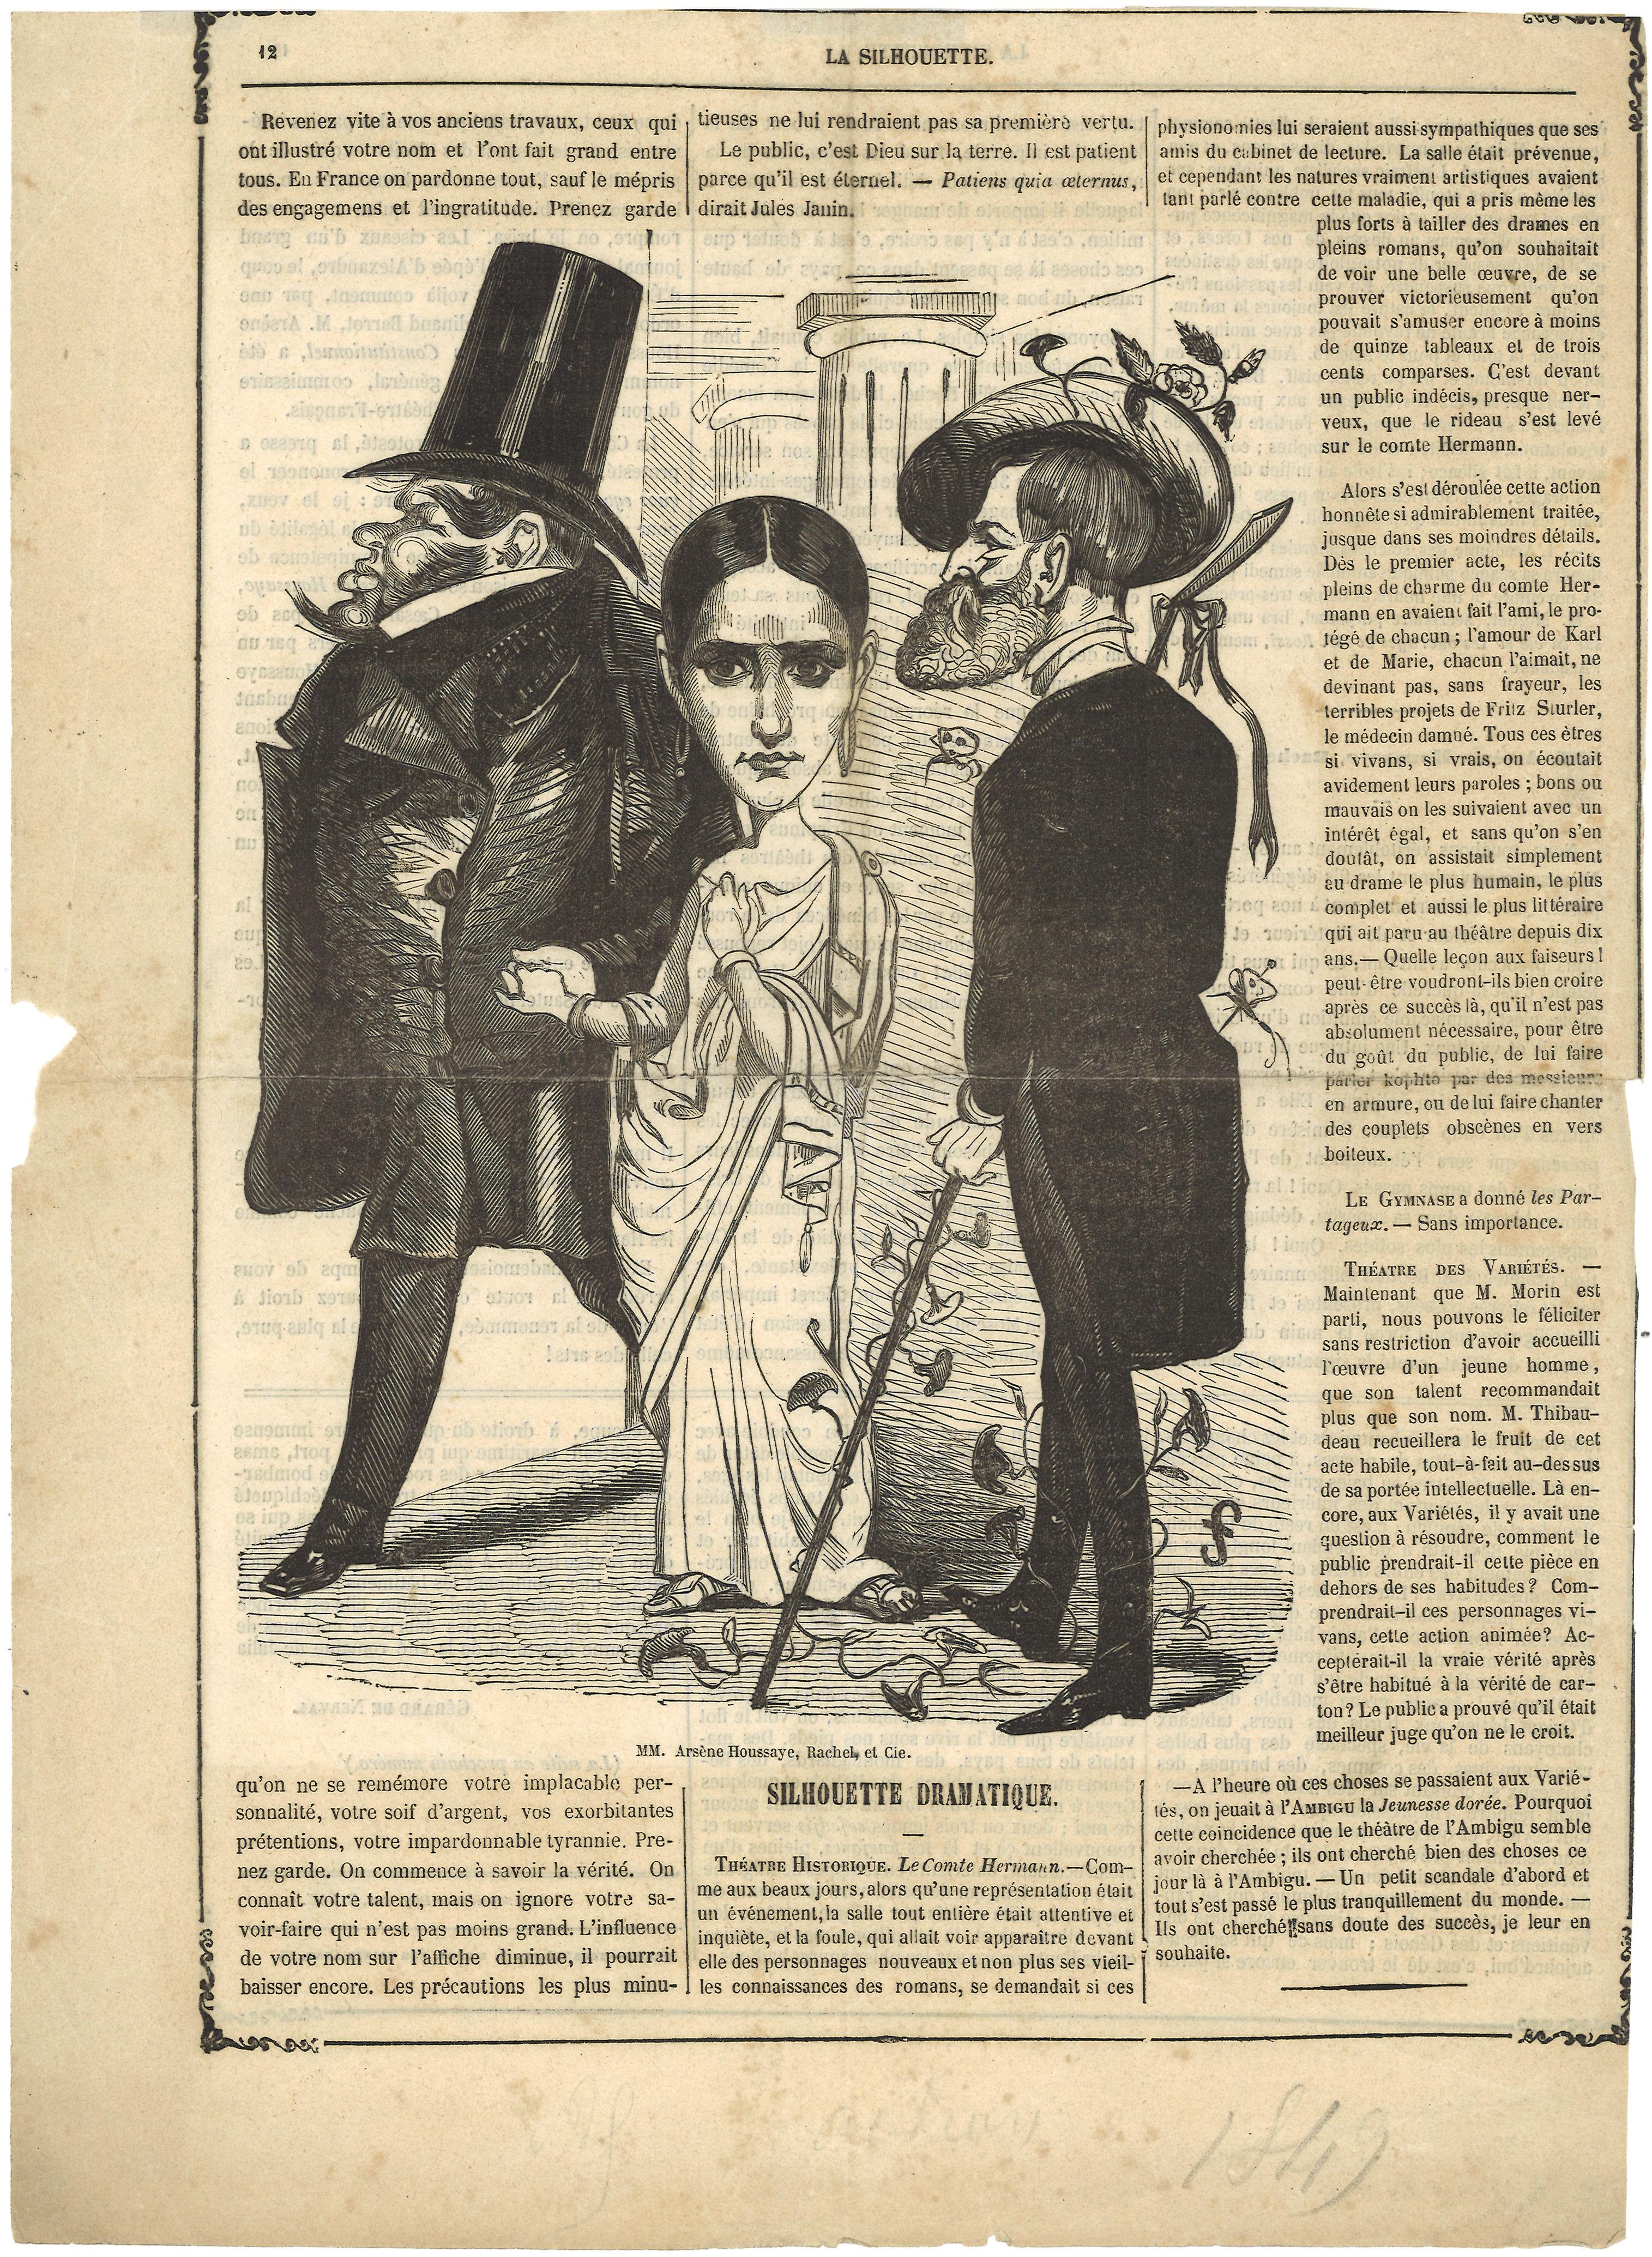 06-rachel-arsane-houssaye-caricature-la-silhouette-1849-